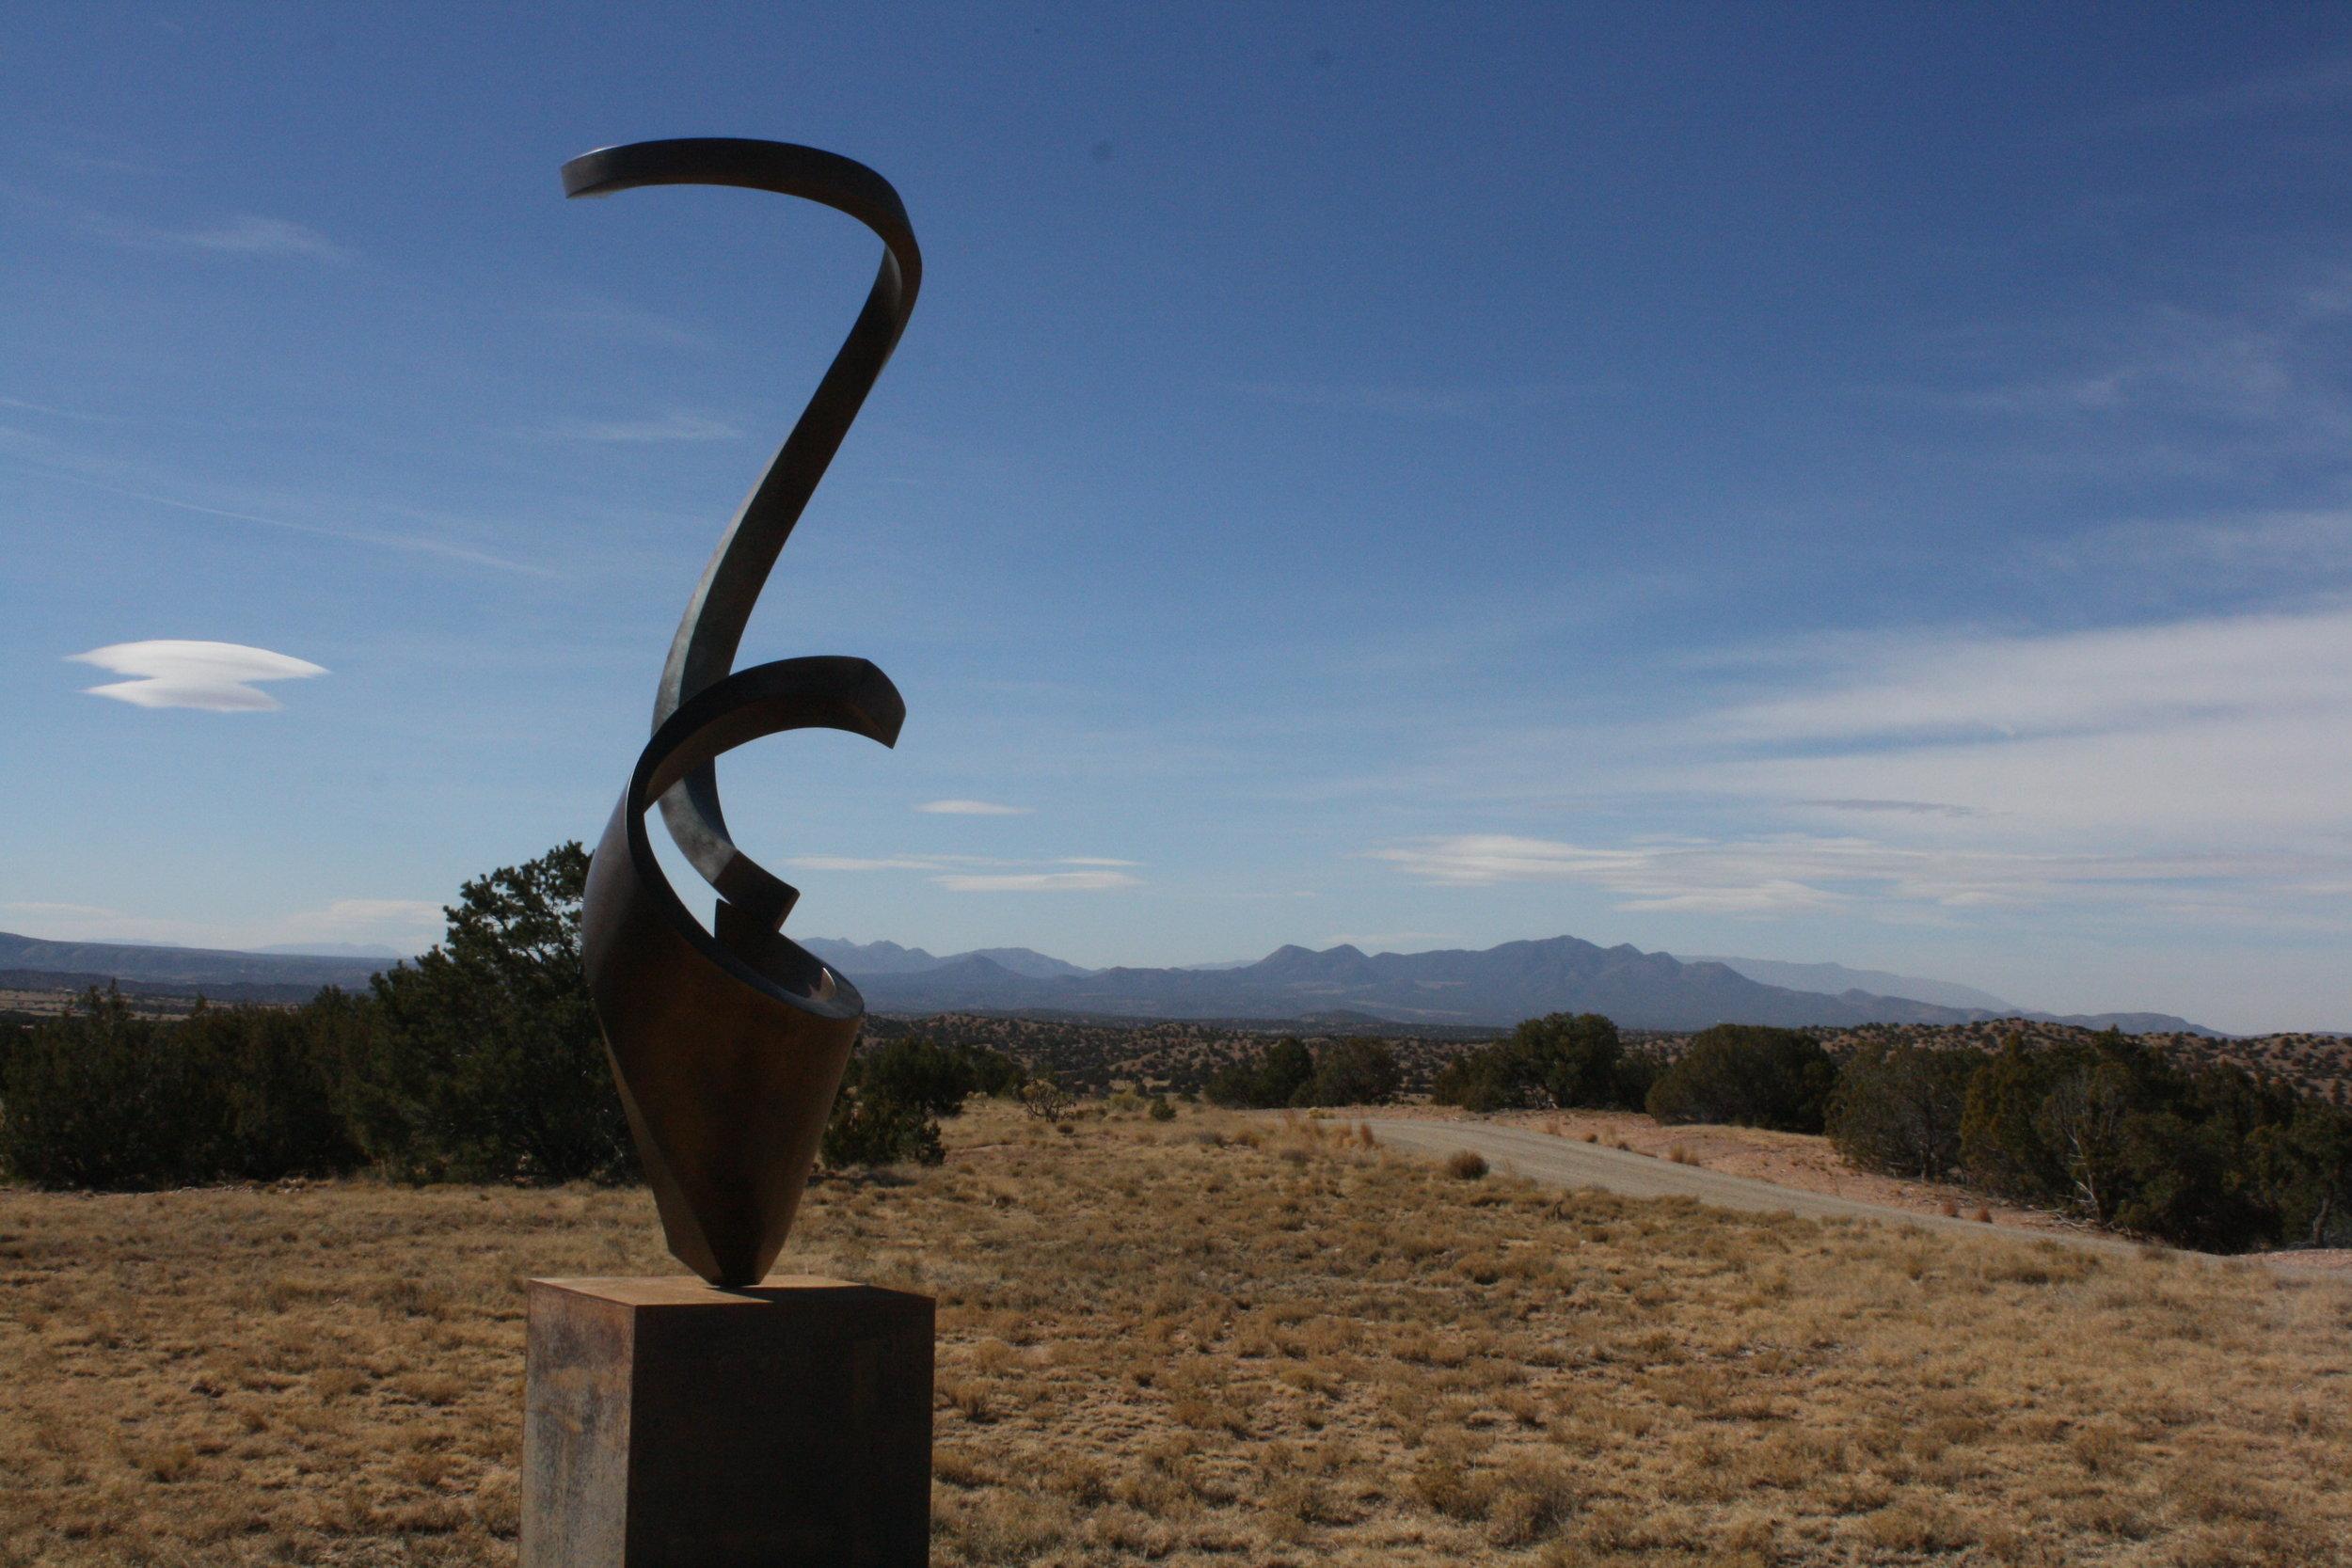 High_Desert_Twist_by_Gino_Miles